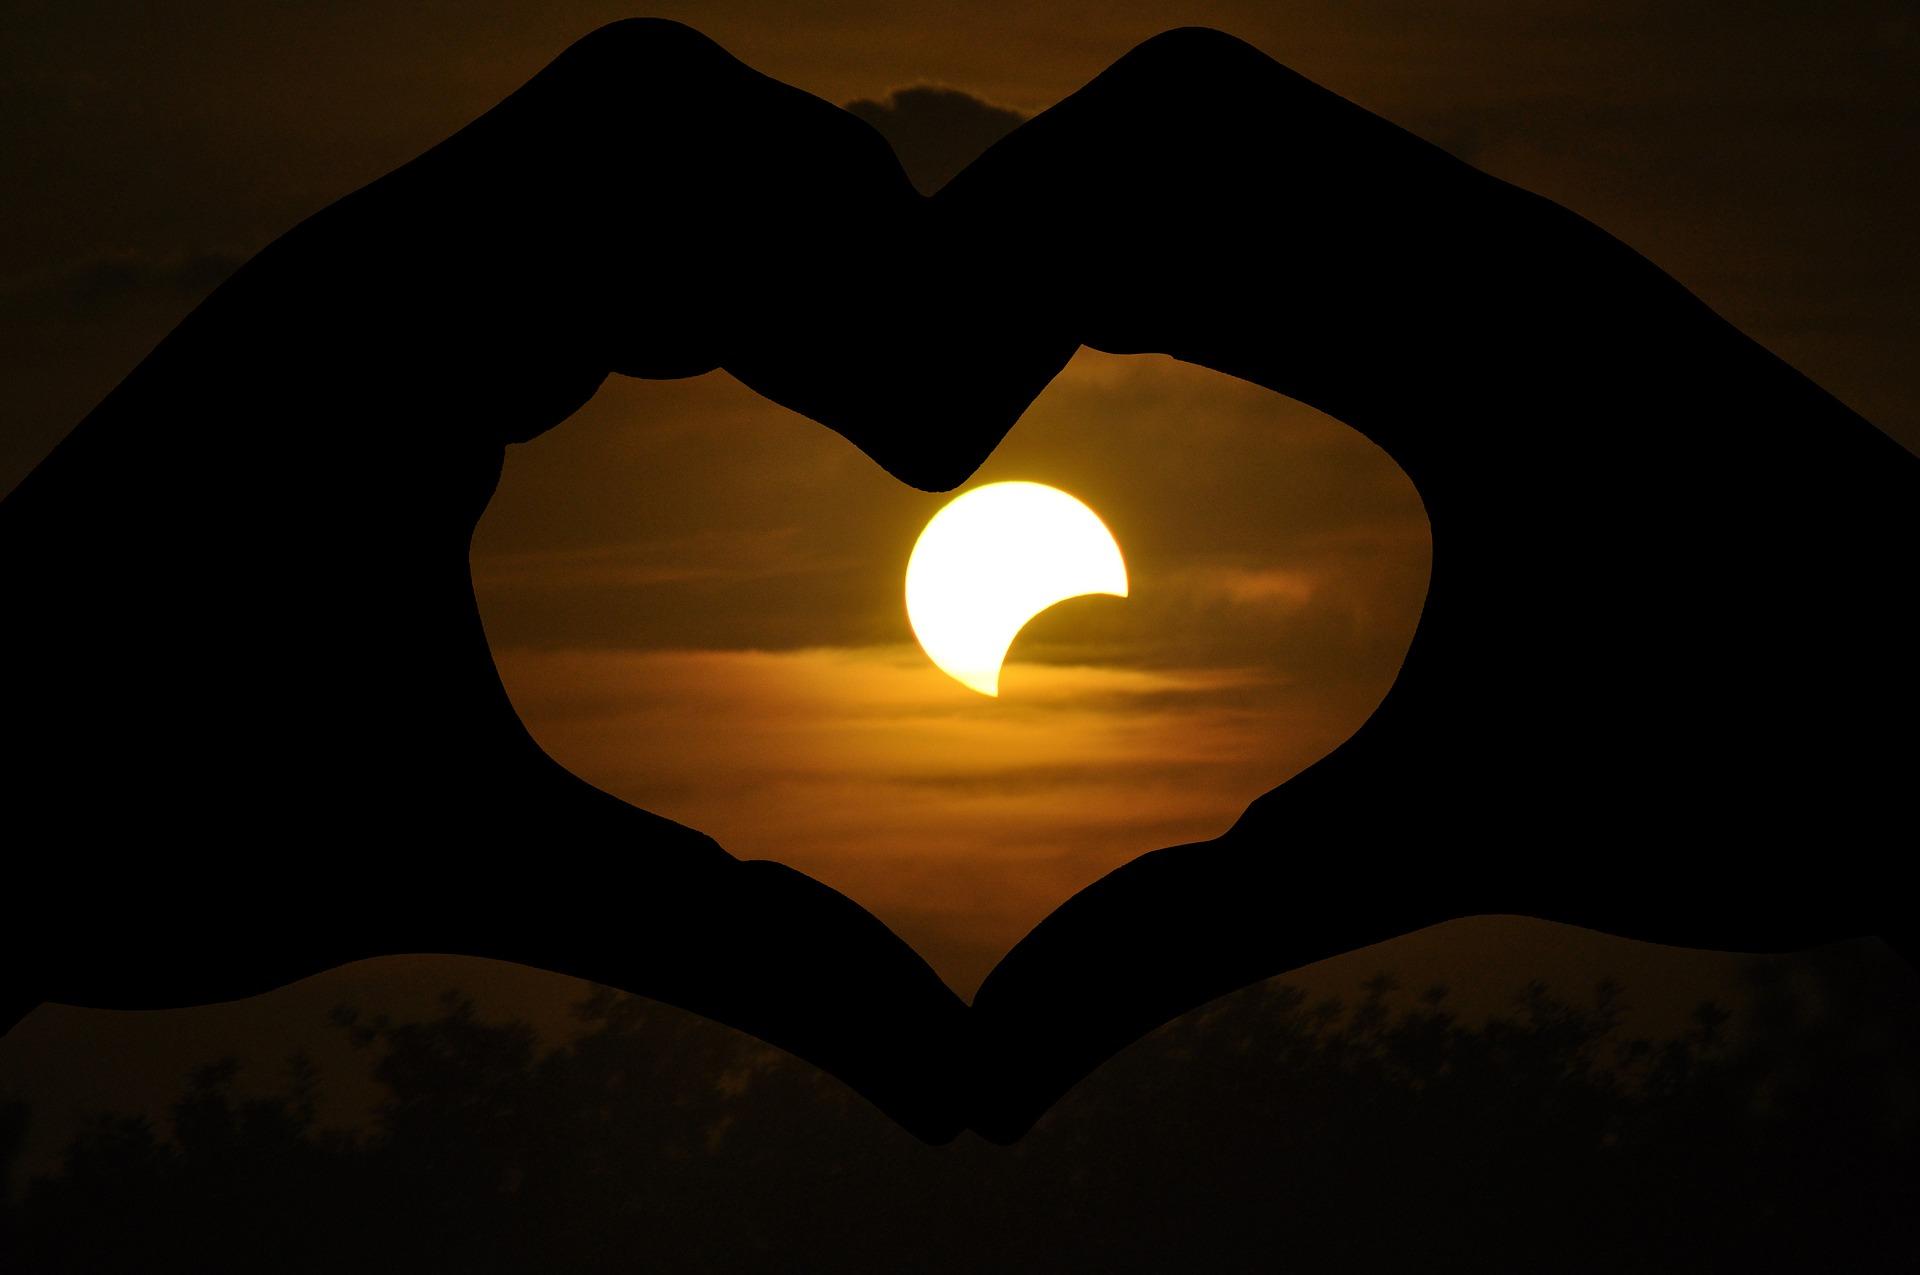 solar-eclipse-2671388_1920